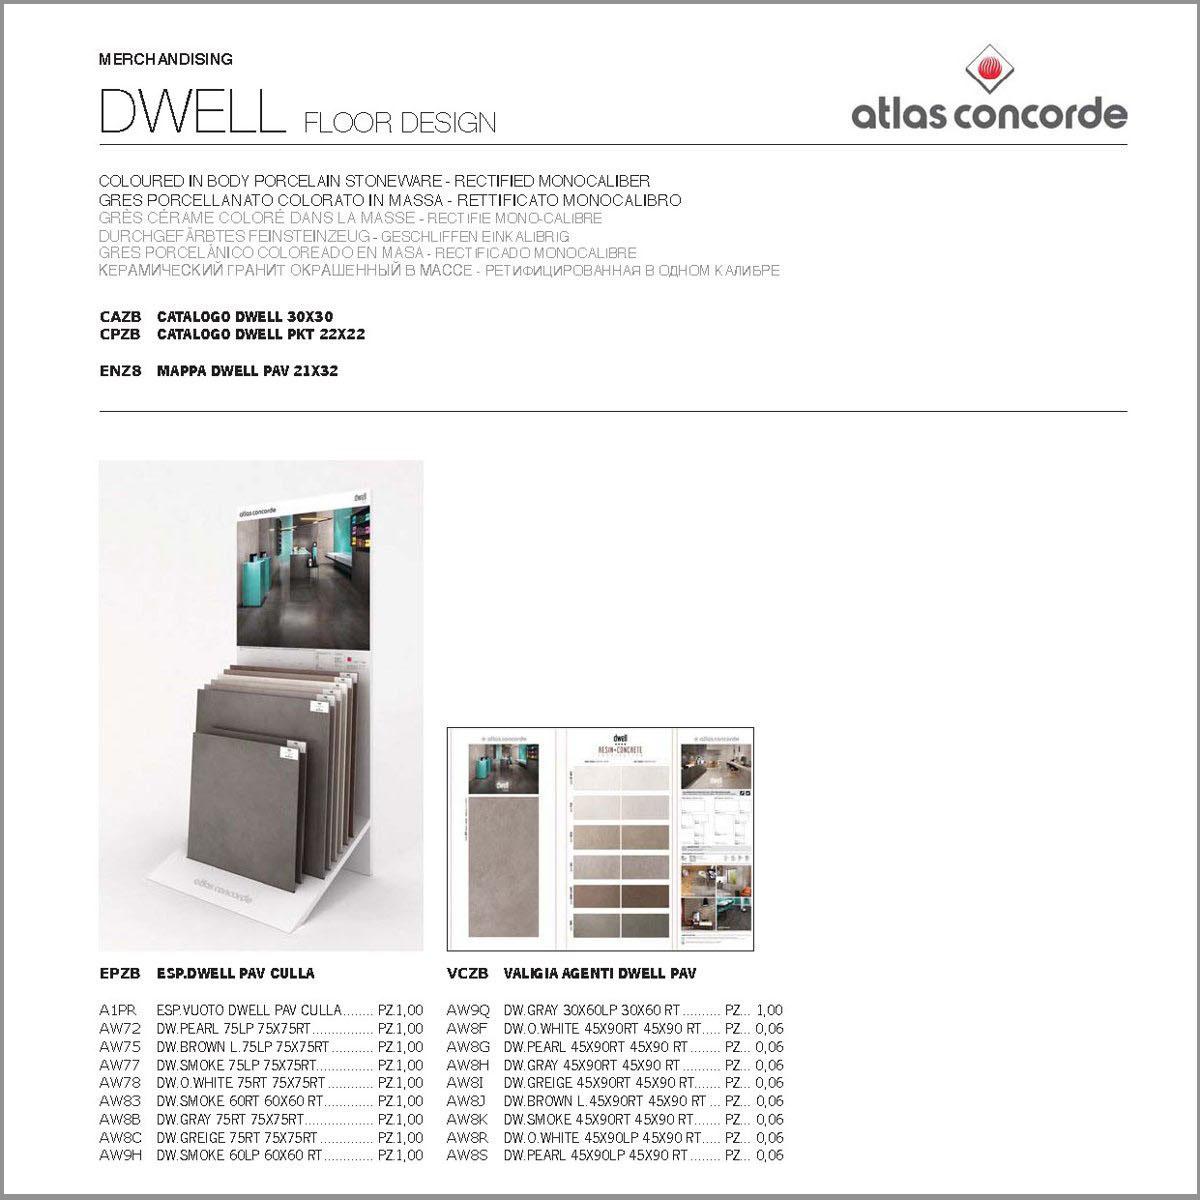 Catalogo Schede Merchandising